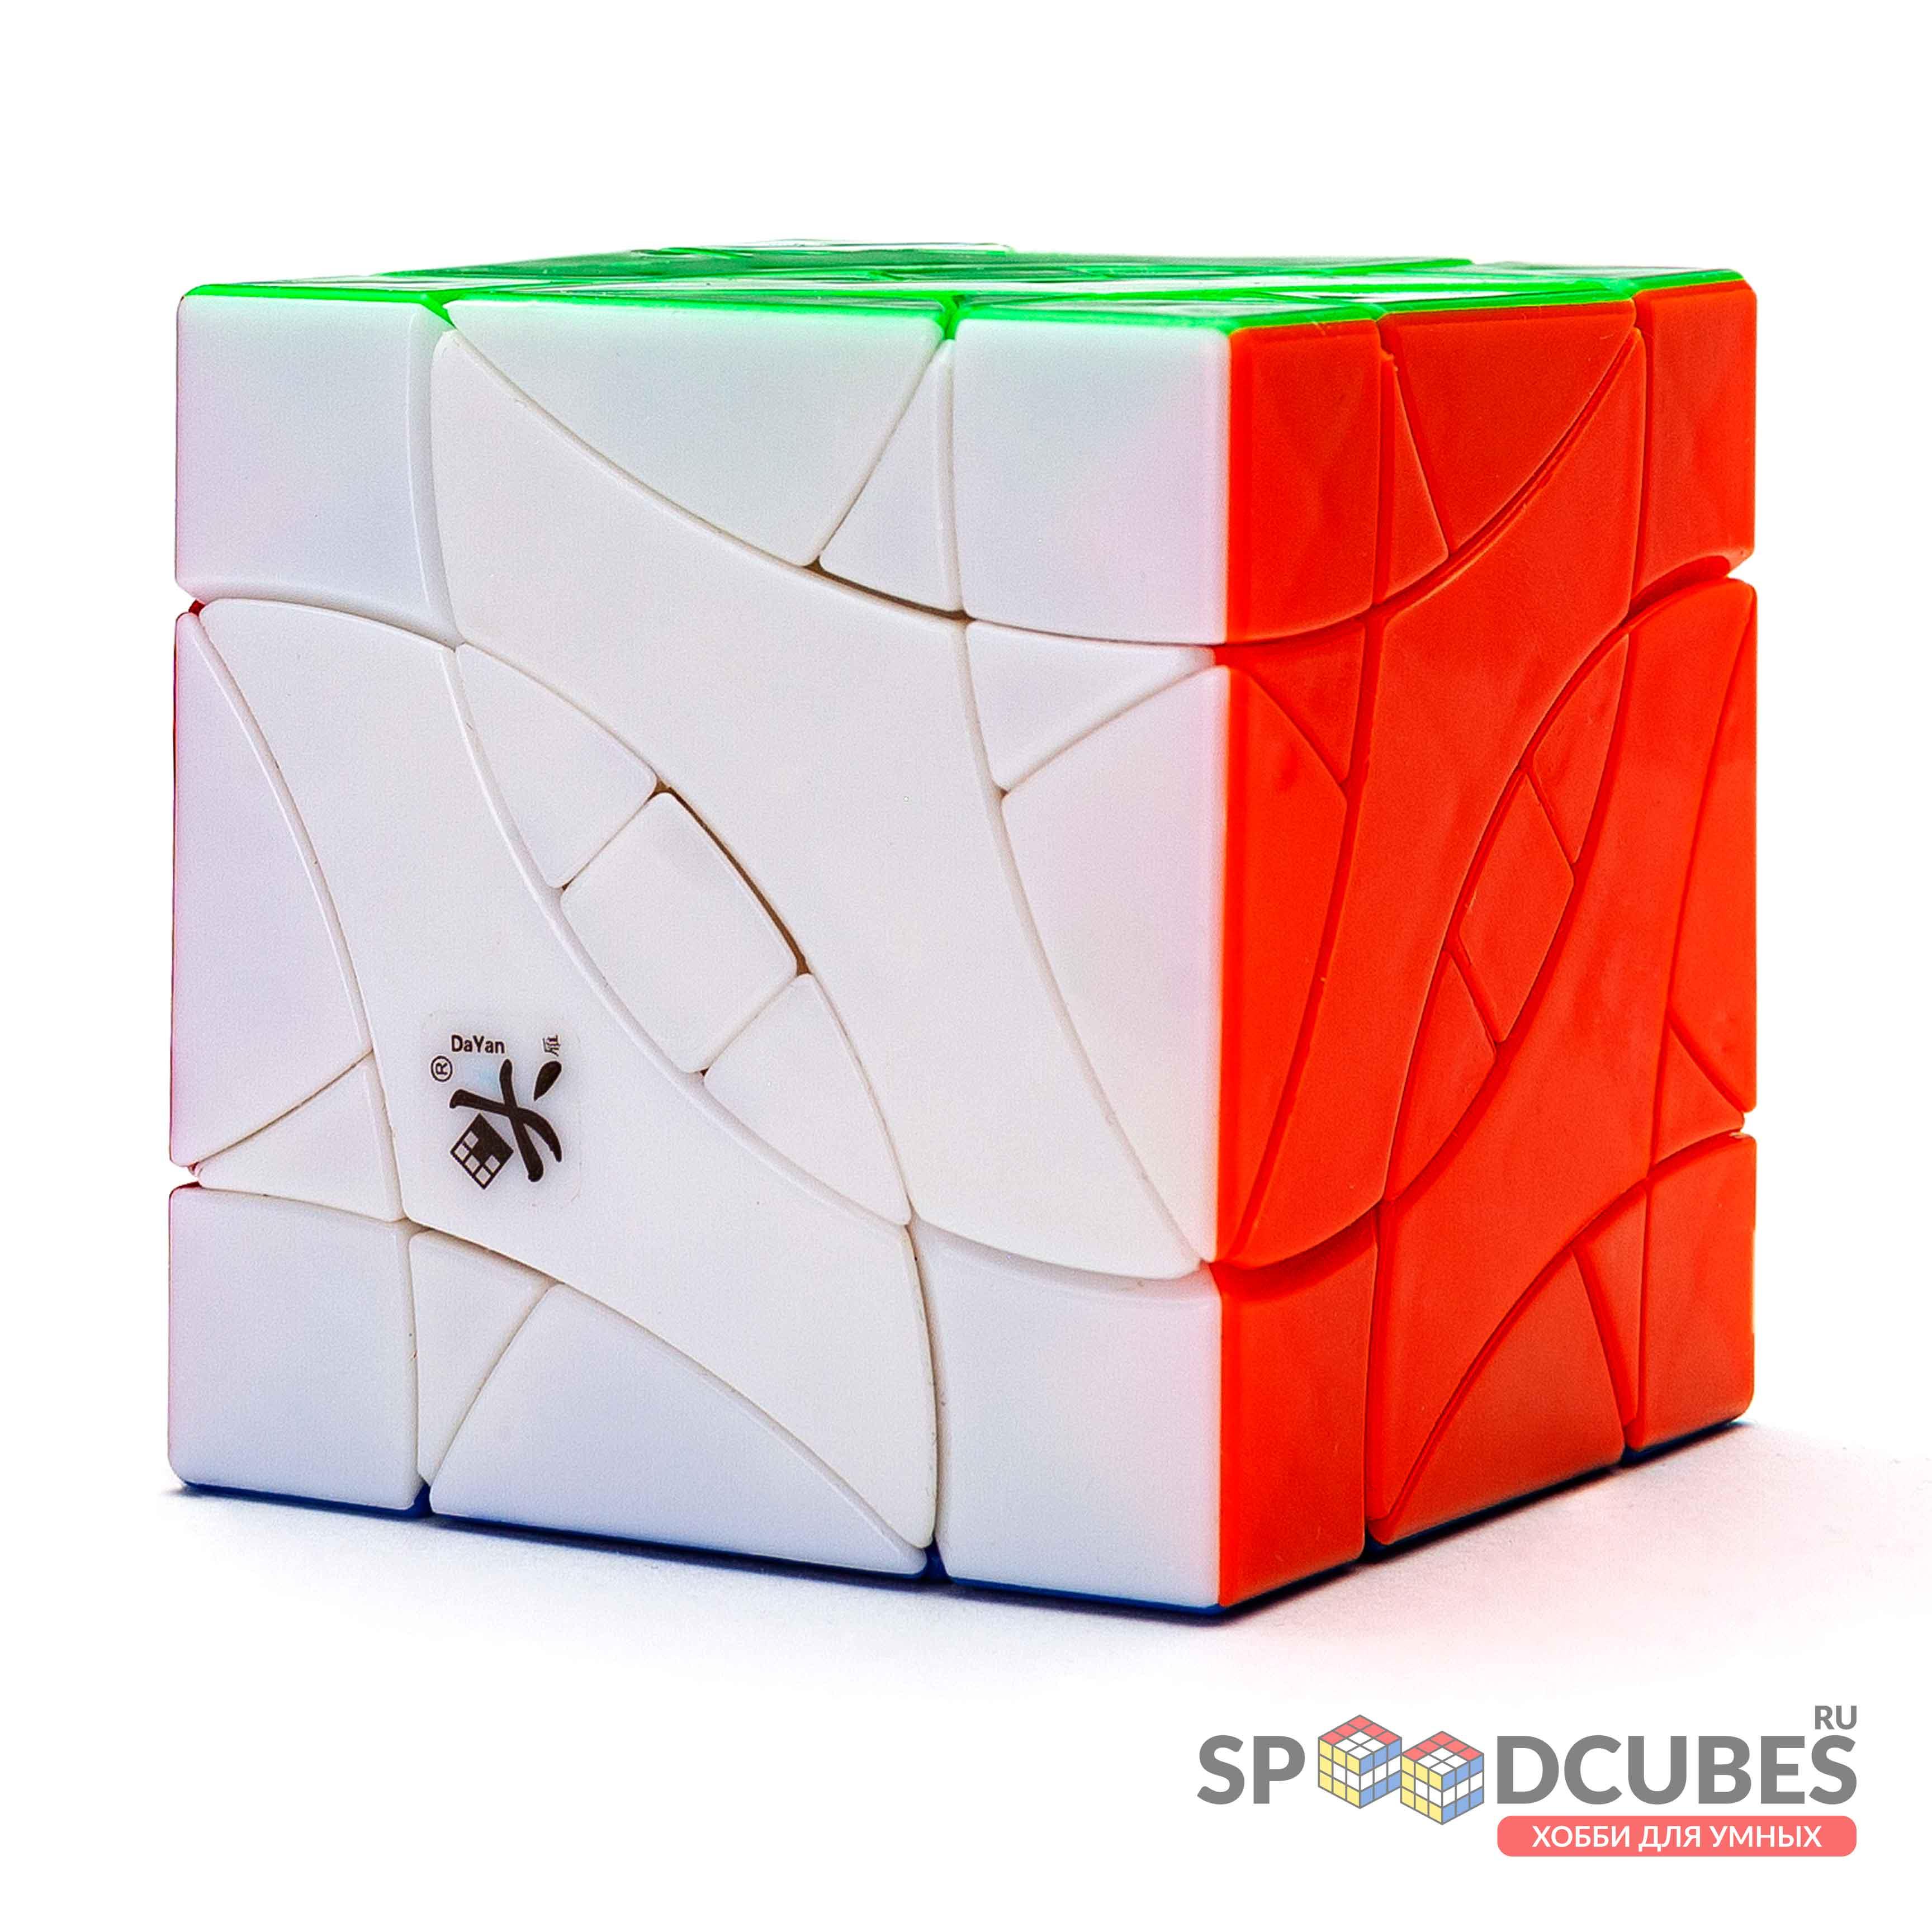 Dayan BiYiNiao Cube (12 Axis)